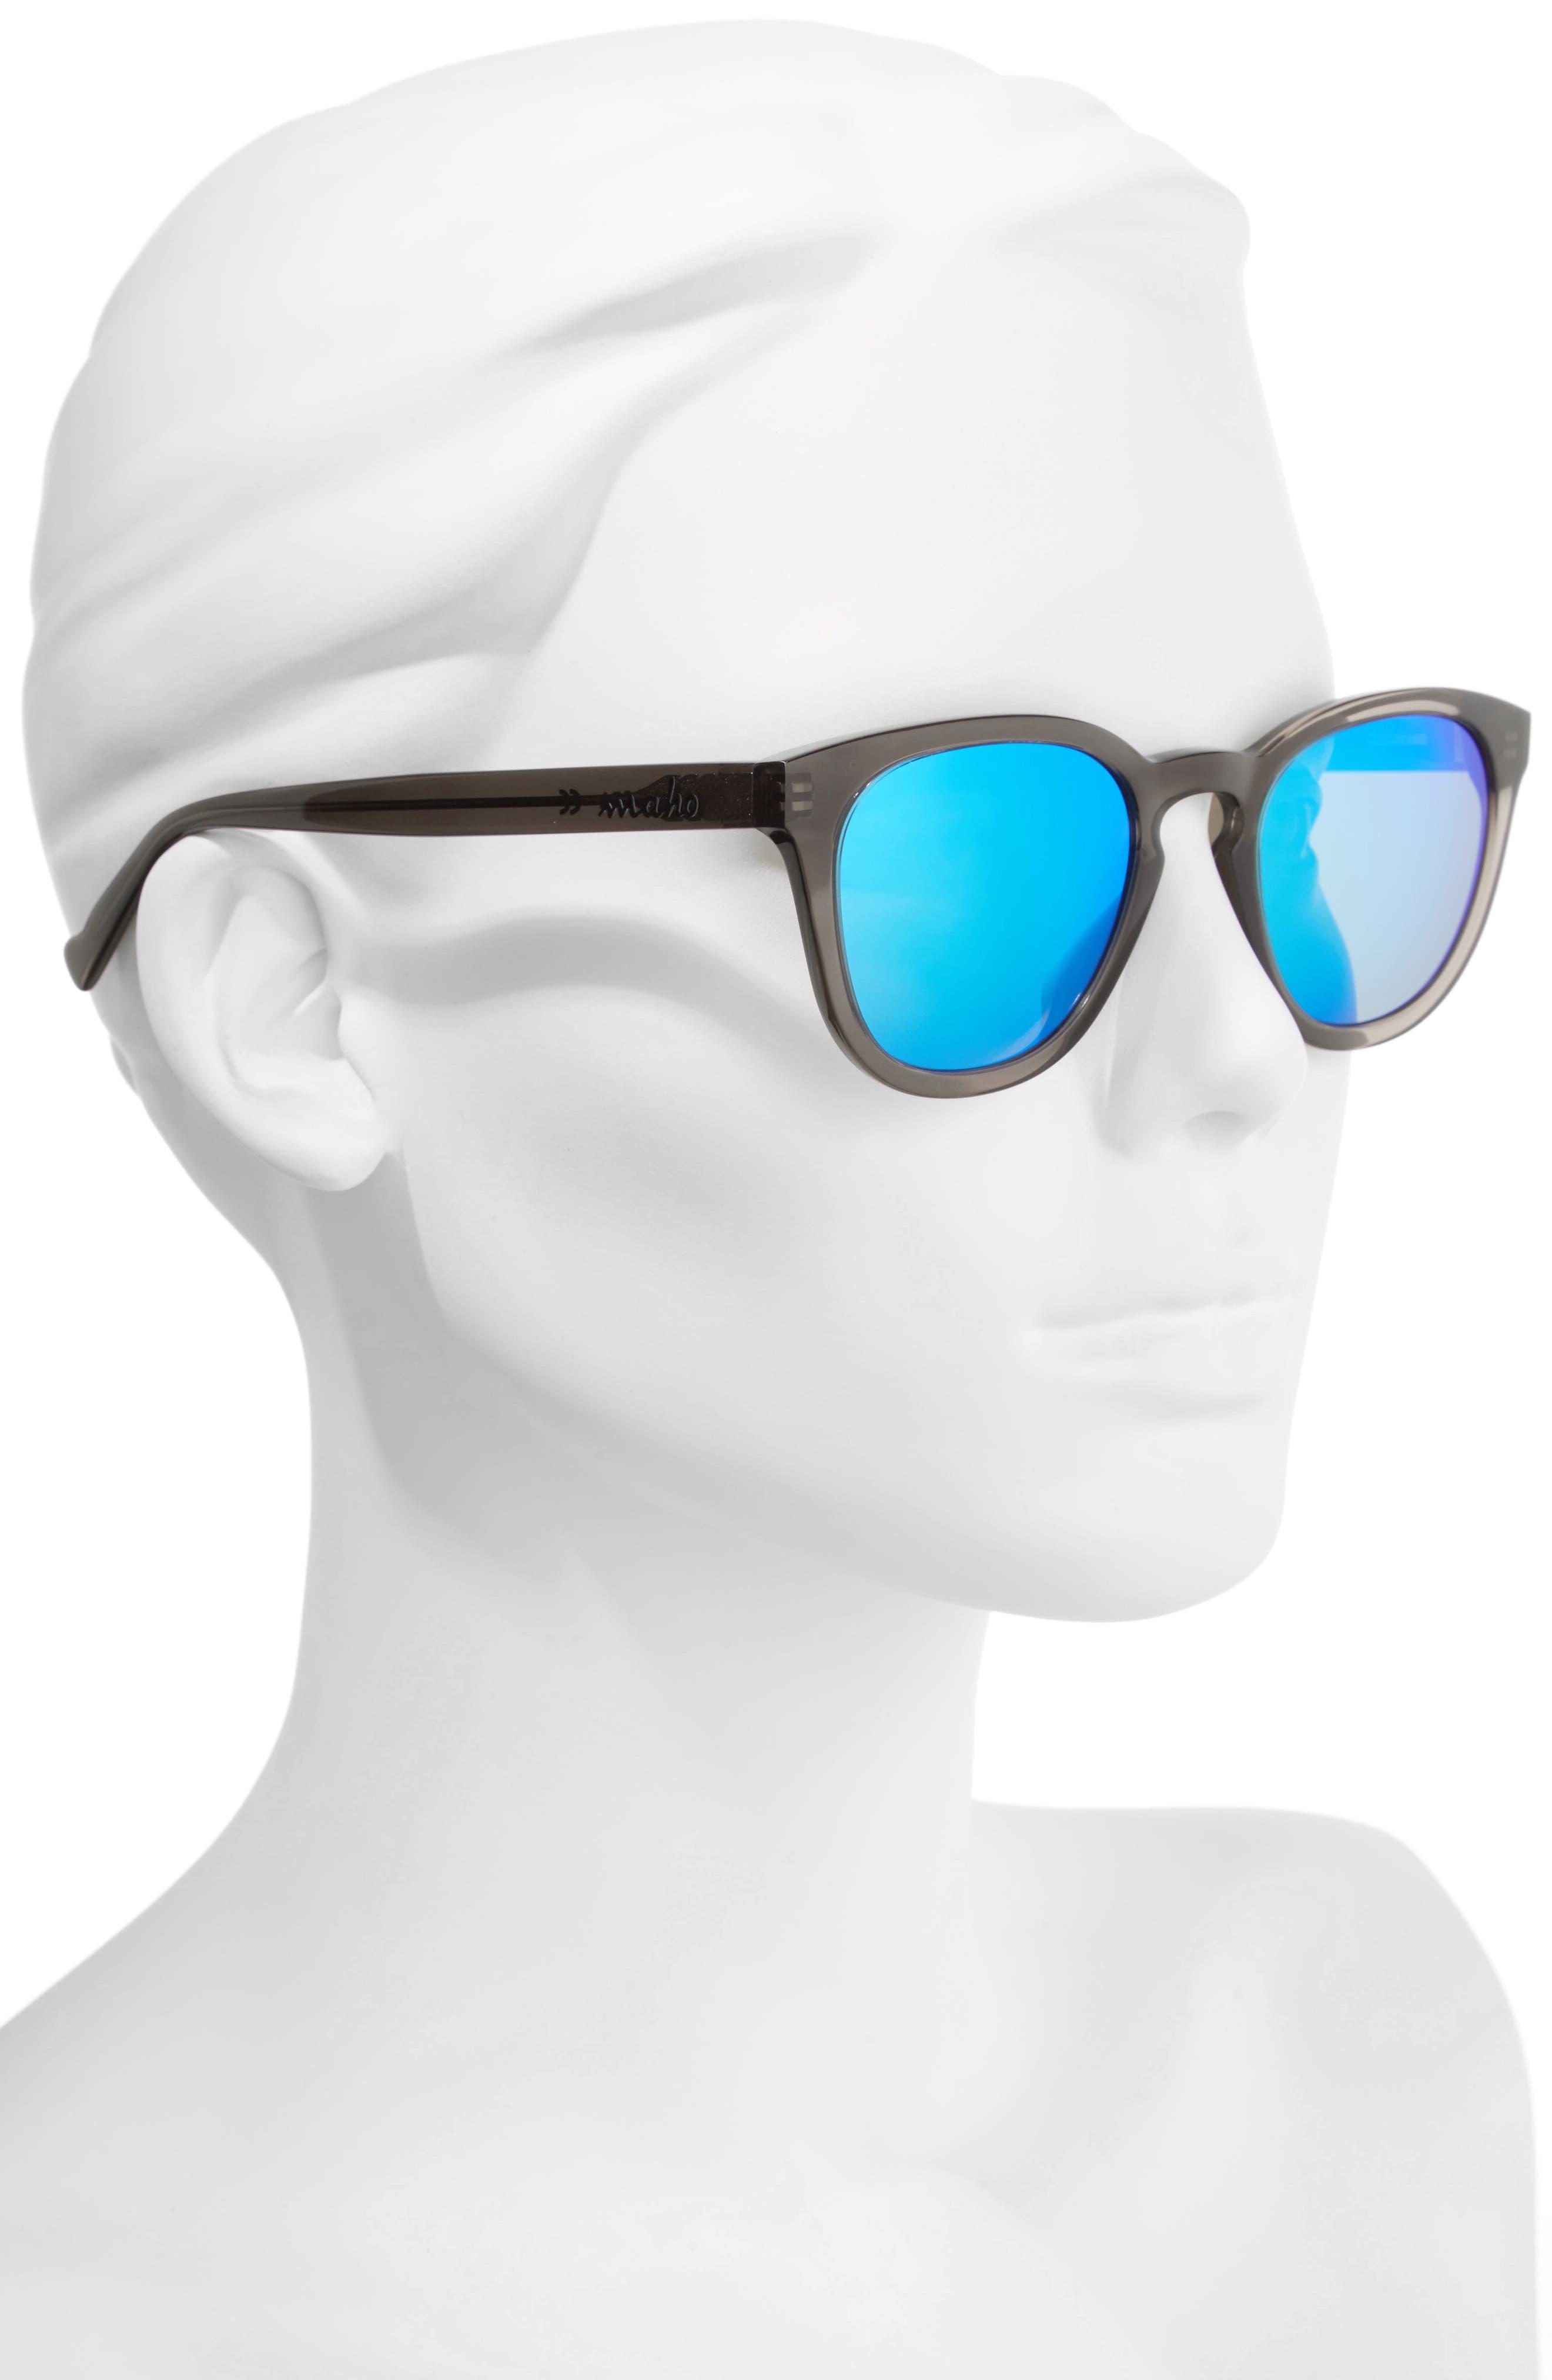 MAHO, Capetown 50mm Polarized Round Sunglasses, Alternate thumbnail 2, color, SLATE